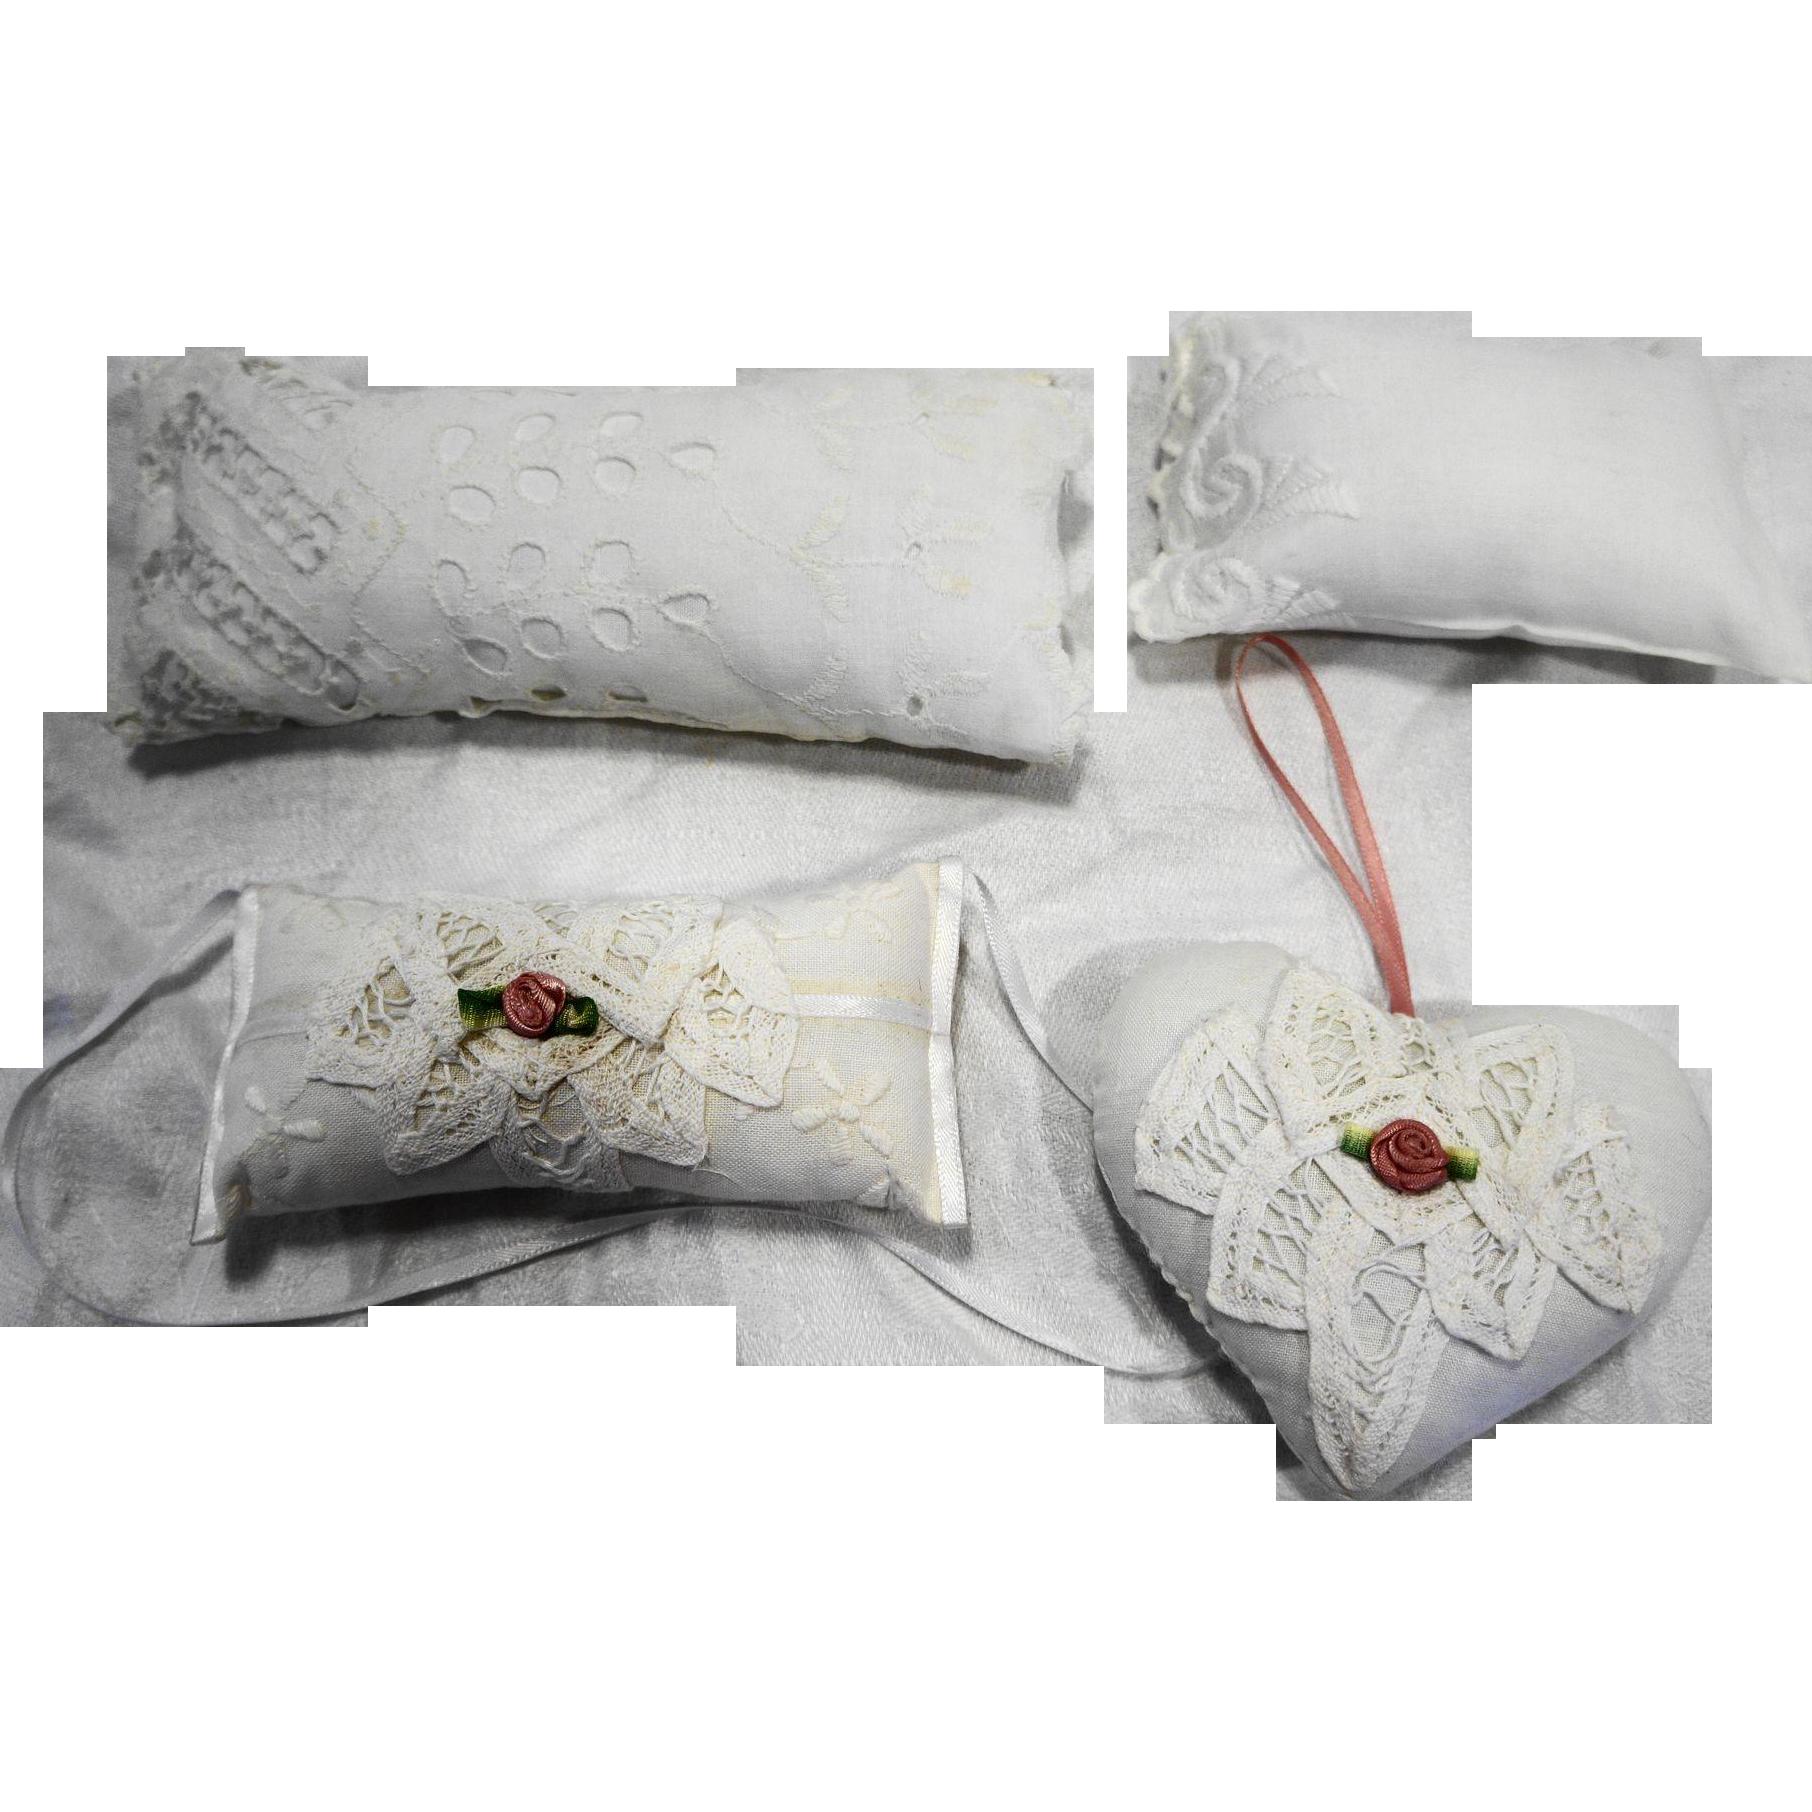 Handmade Lace Doll Pillows And Ribbon Lace Sachets Set 4 PC